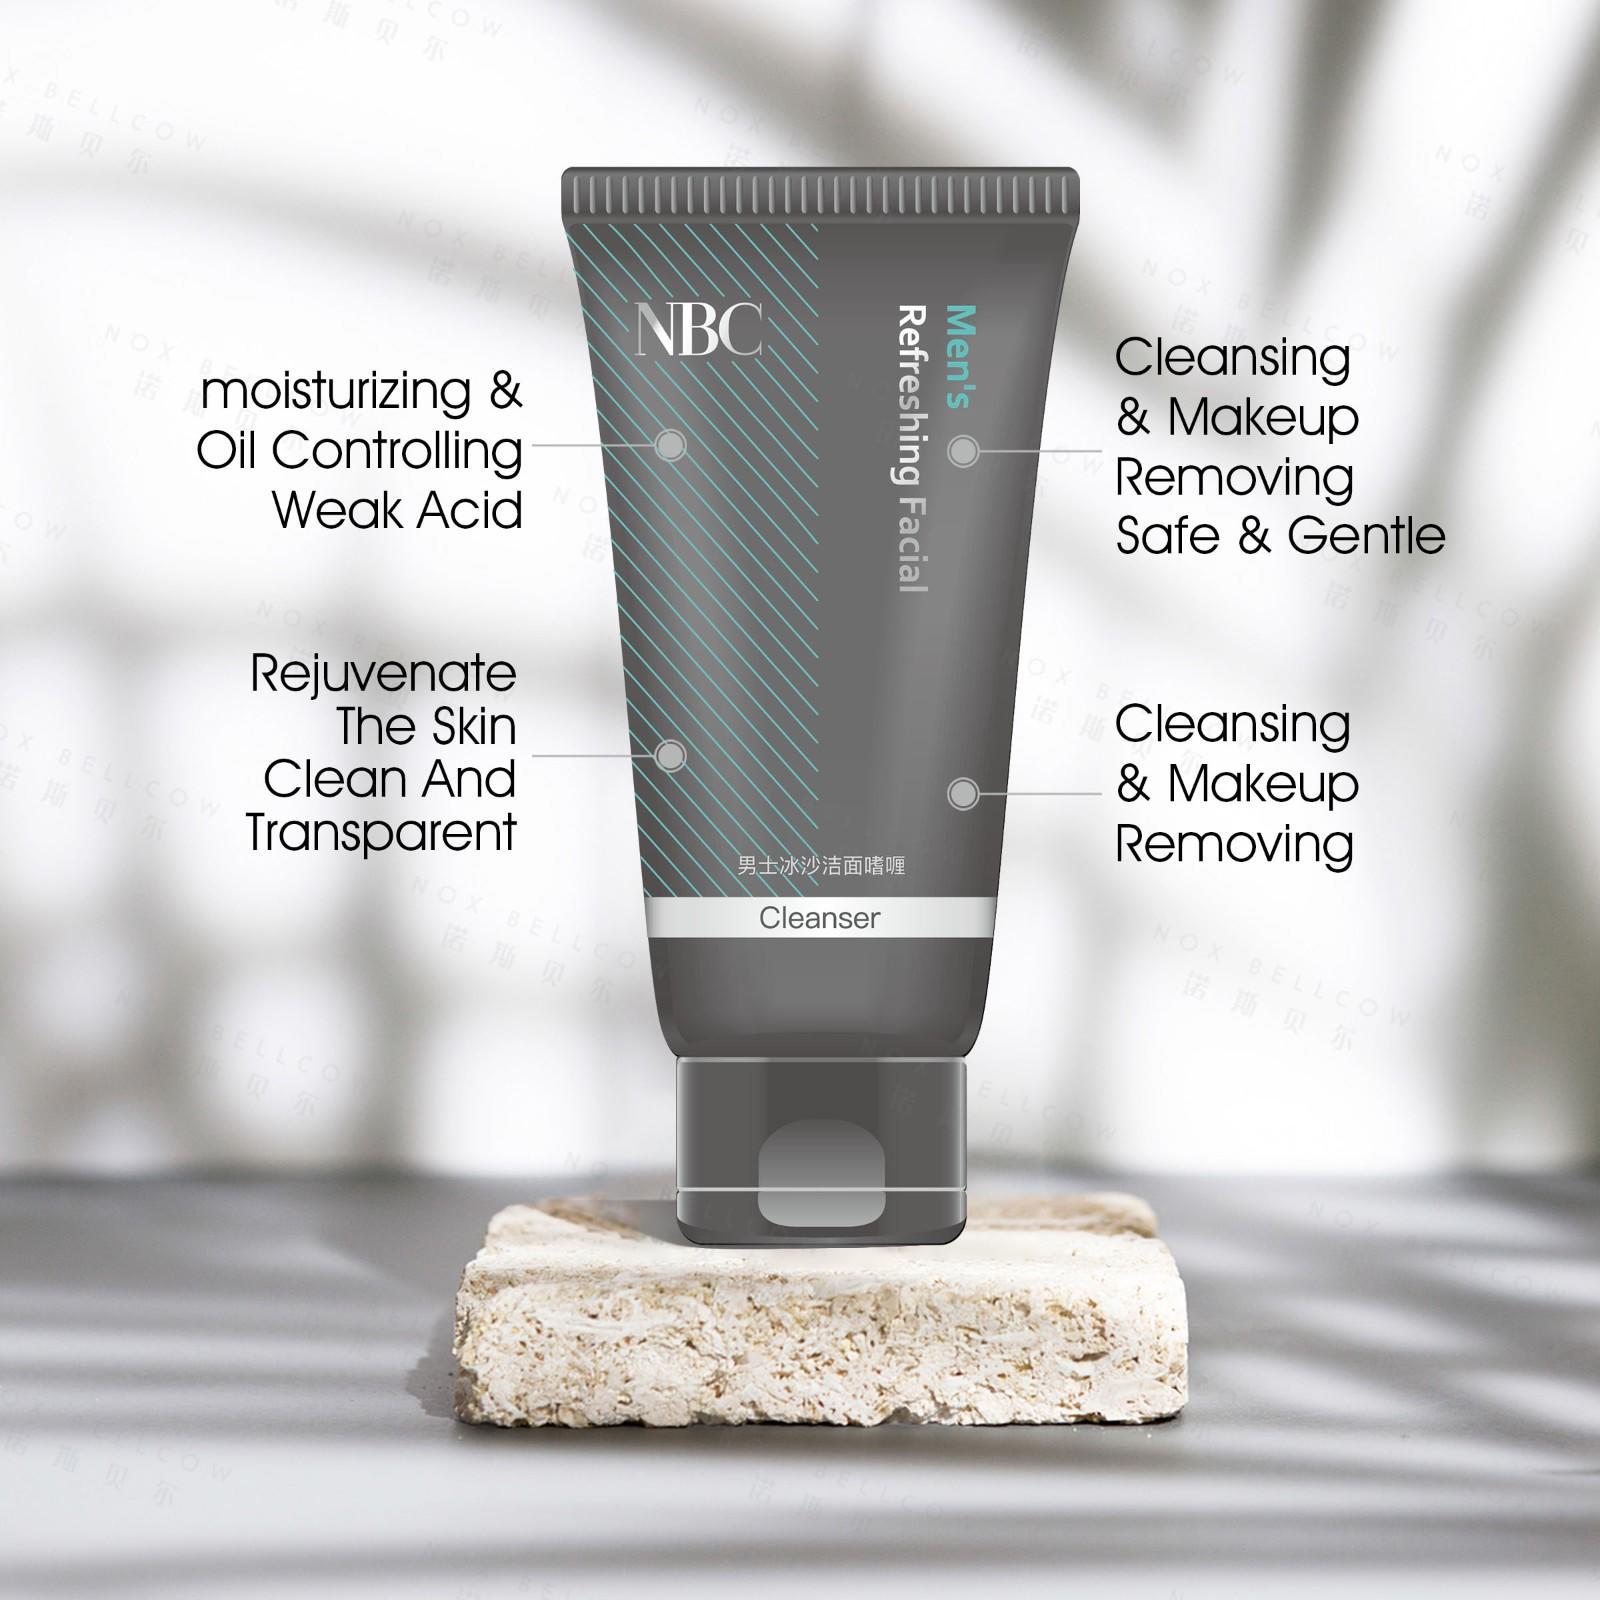 NOX BELLCOW Best Men's skin care company for women-1